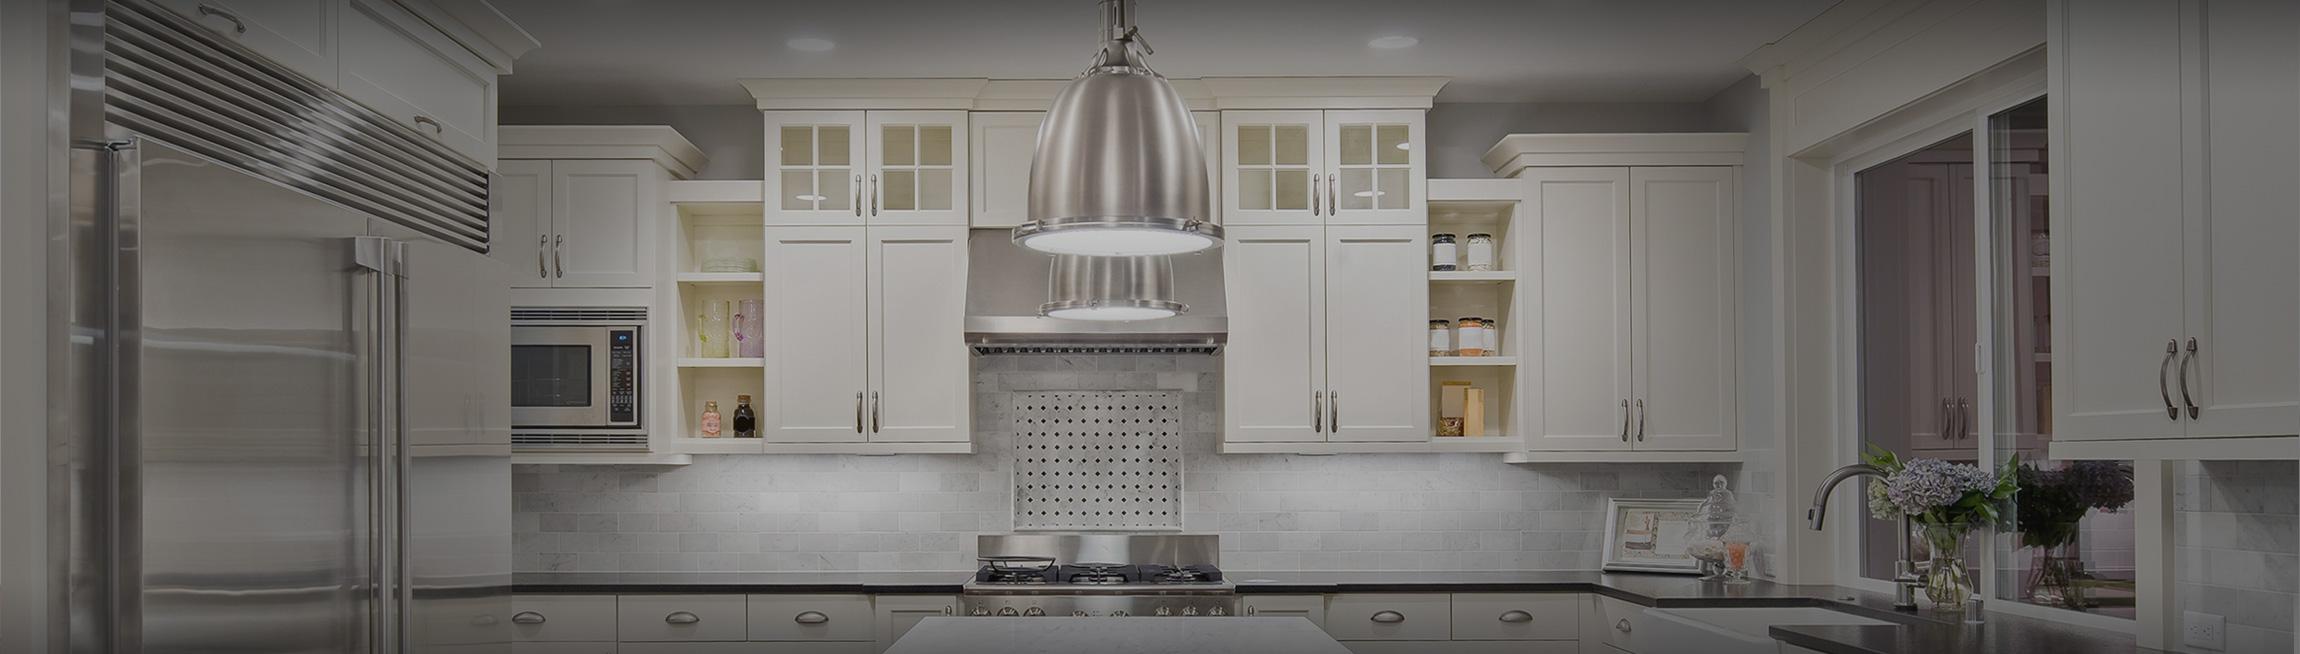 Tip Top Kitchens Gallery